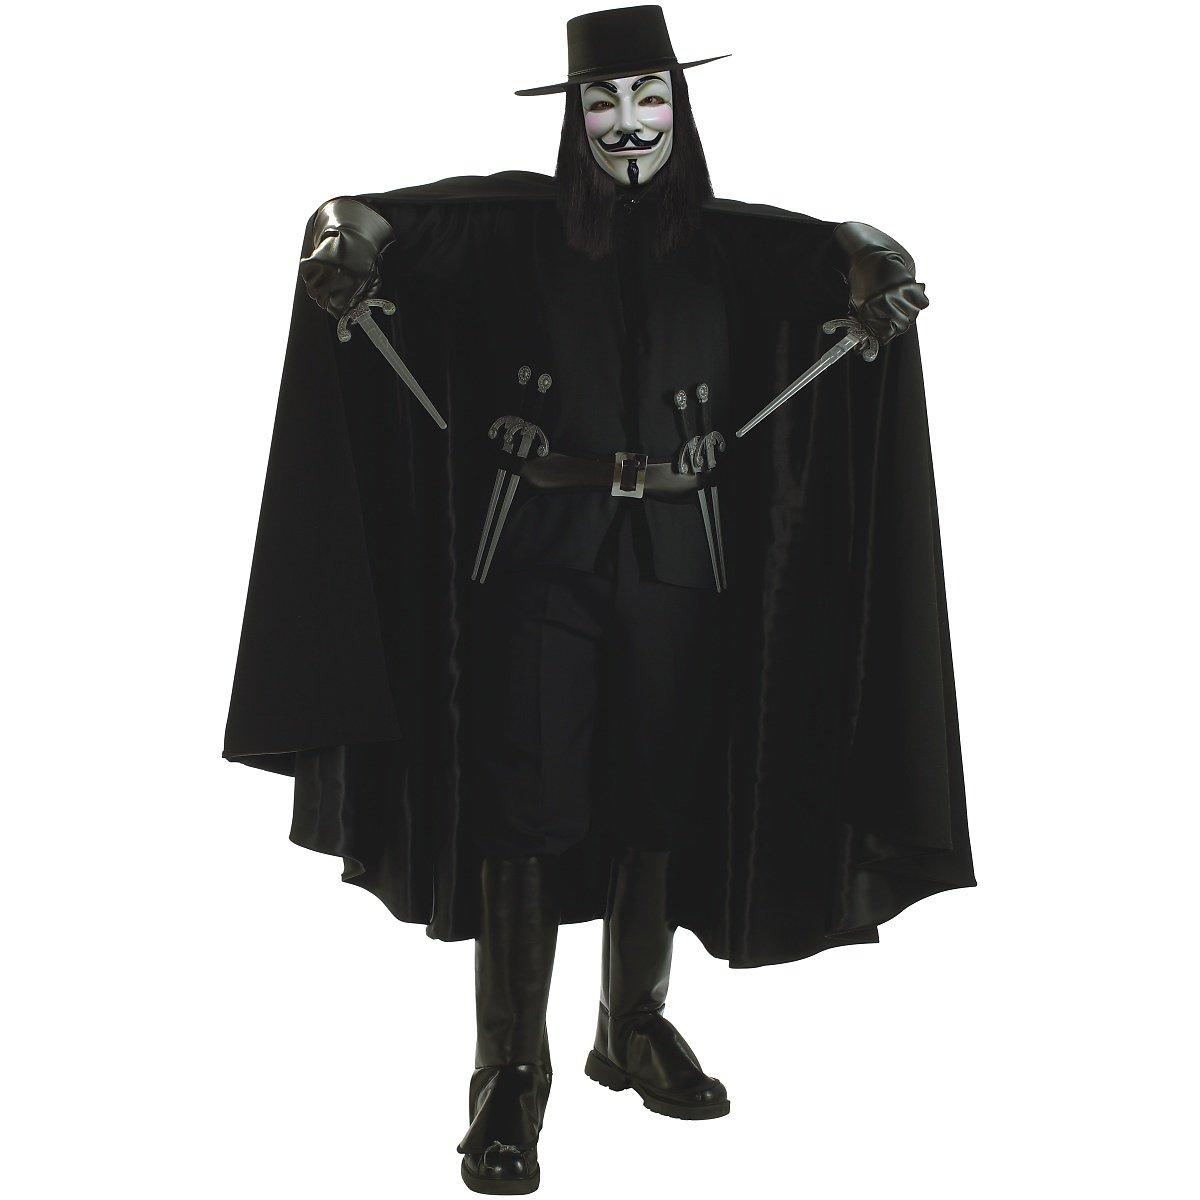 Super Deluxe V for Vendetta Adult Costume - Standard